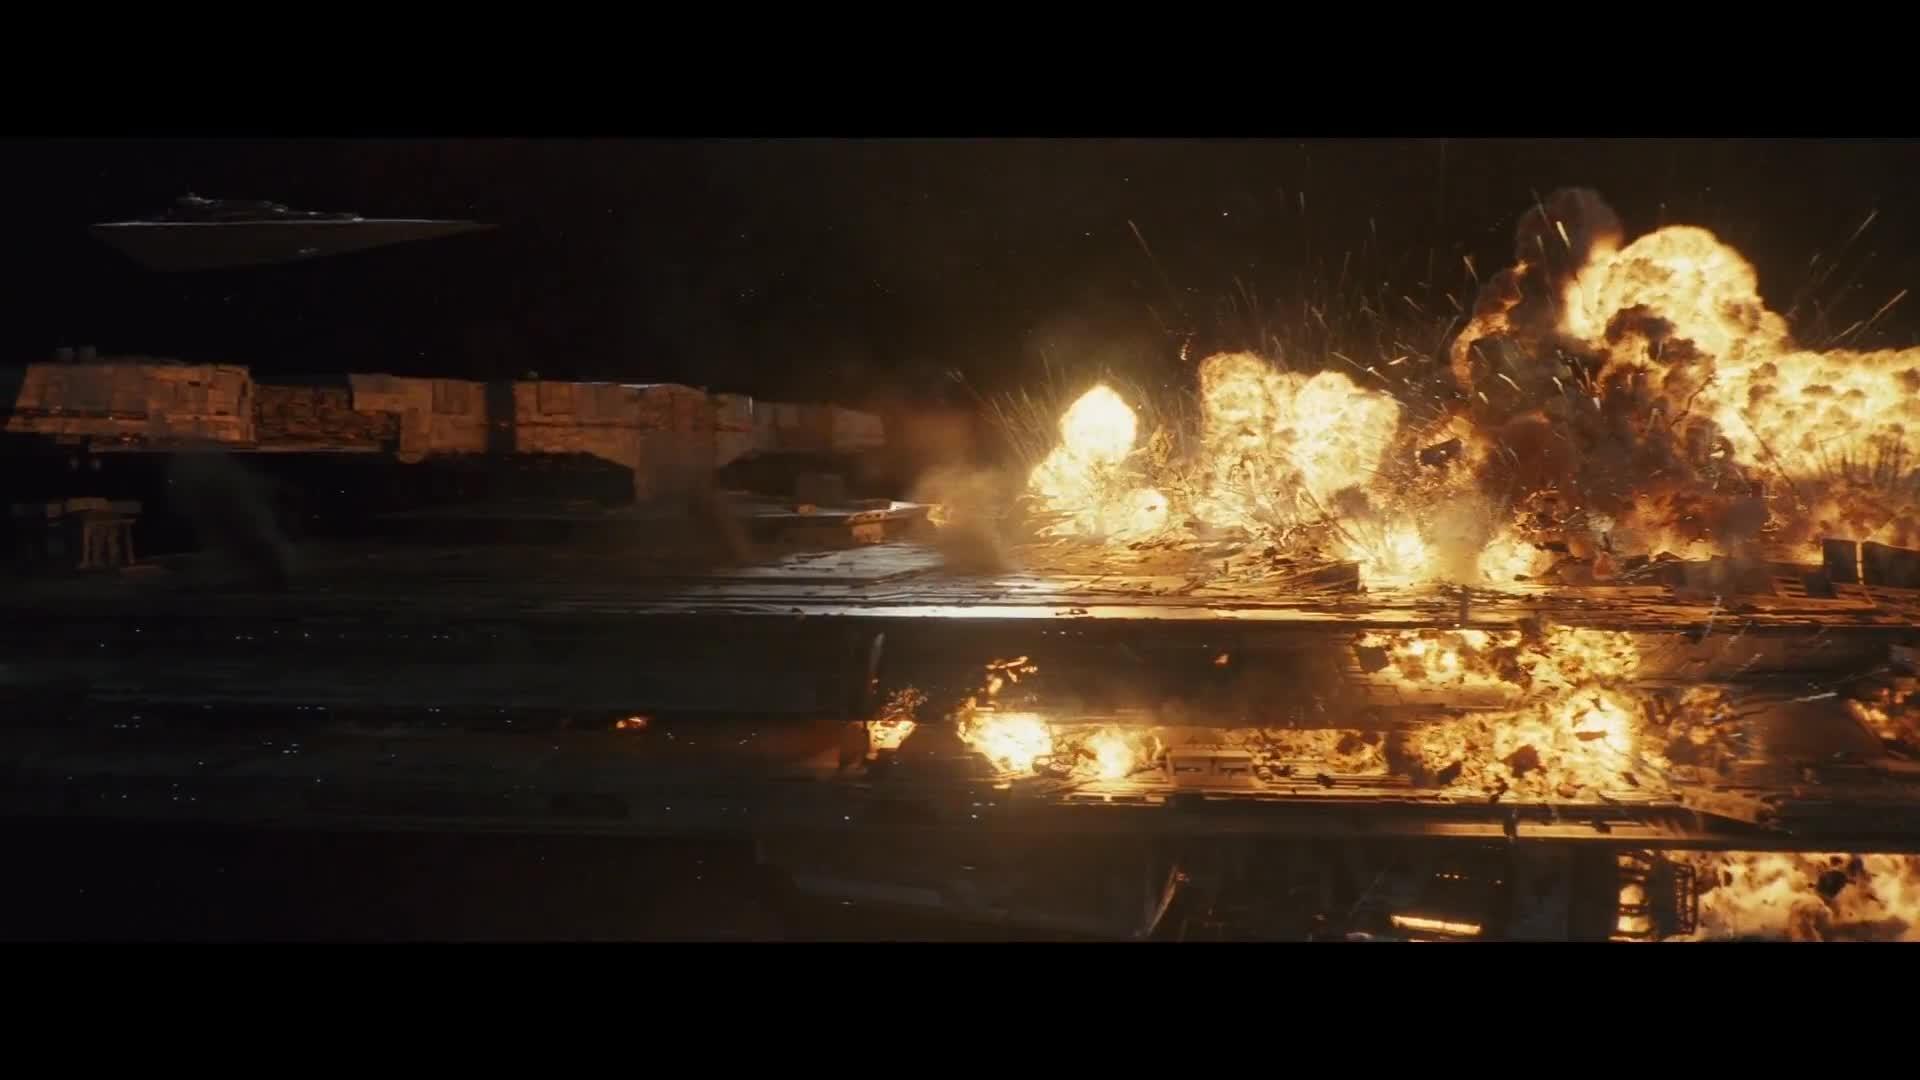 Star Wars The Last Jedi Dreadnought Destroyed Scene Gif By Catc0r0 Gfycat